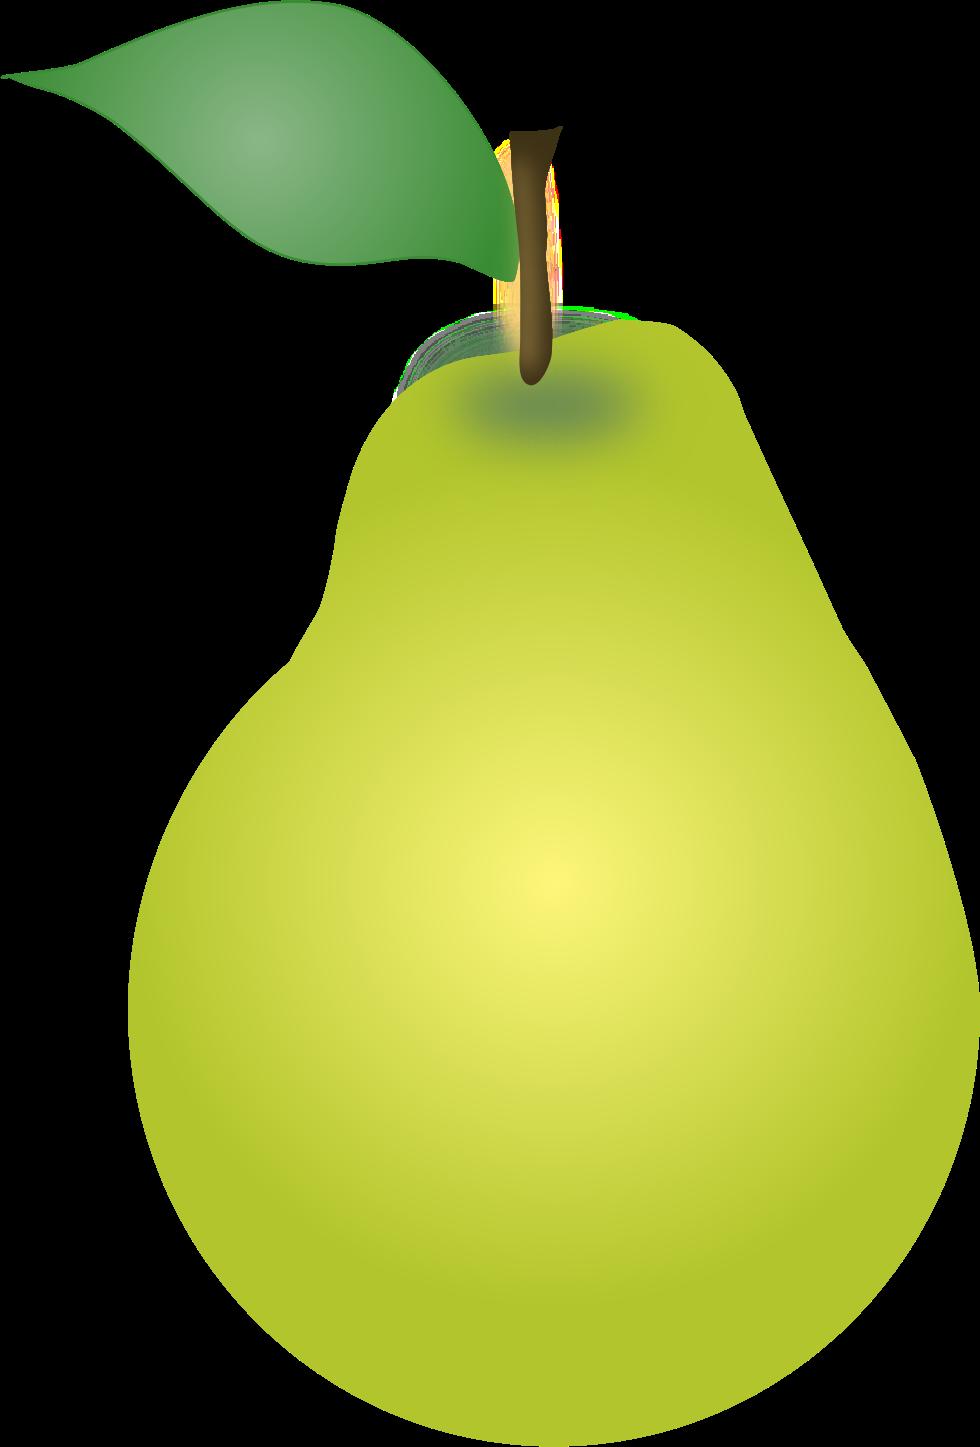 Svg clip art png transparent stock Clipart - Pear SVG, Pear clipart png transparent stock